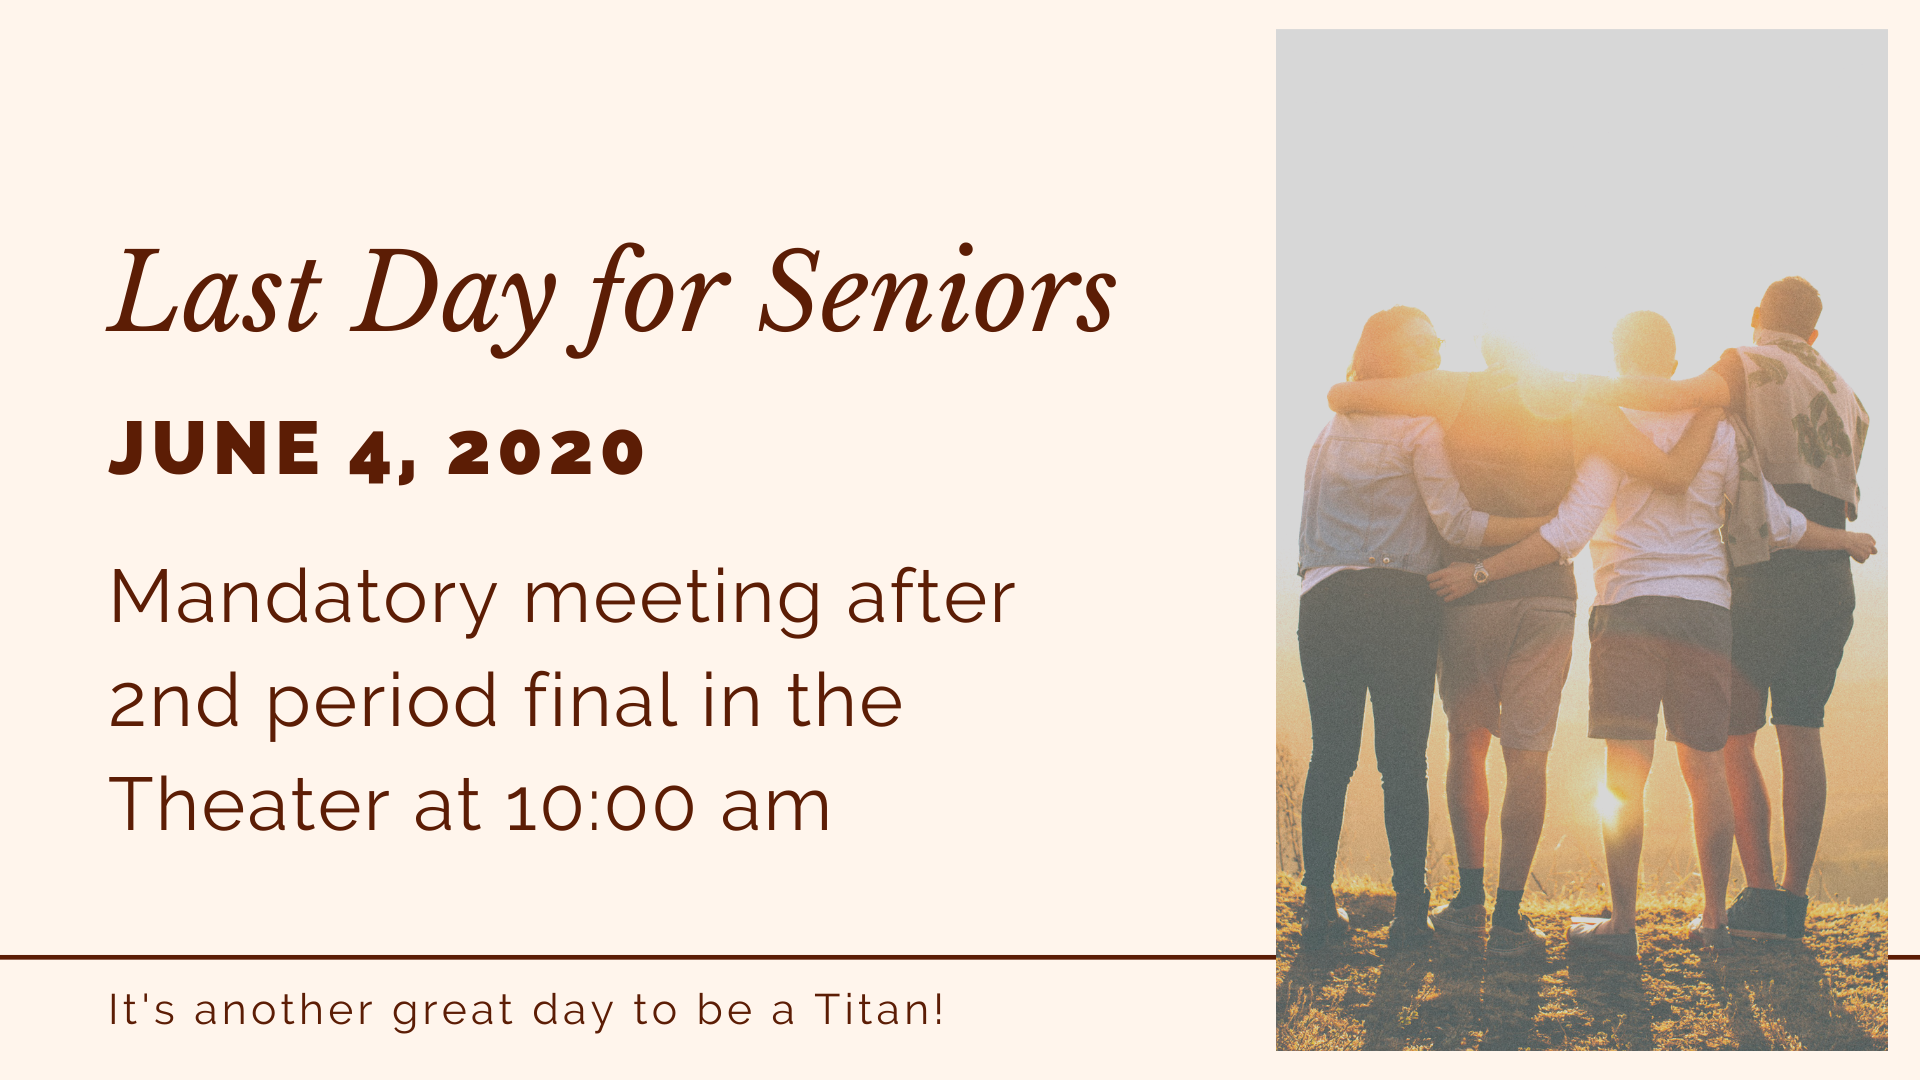 seniors last day